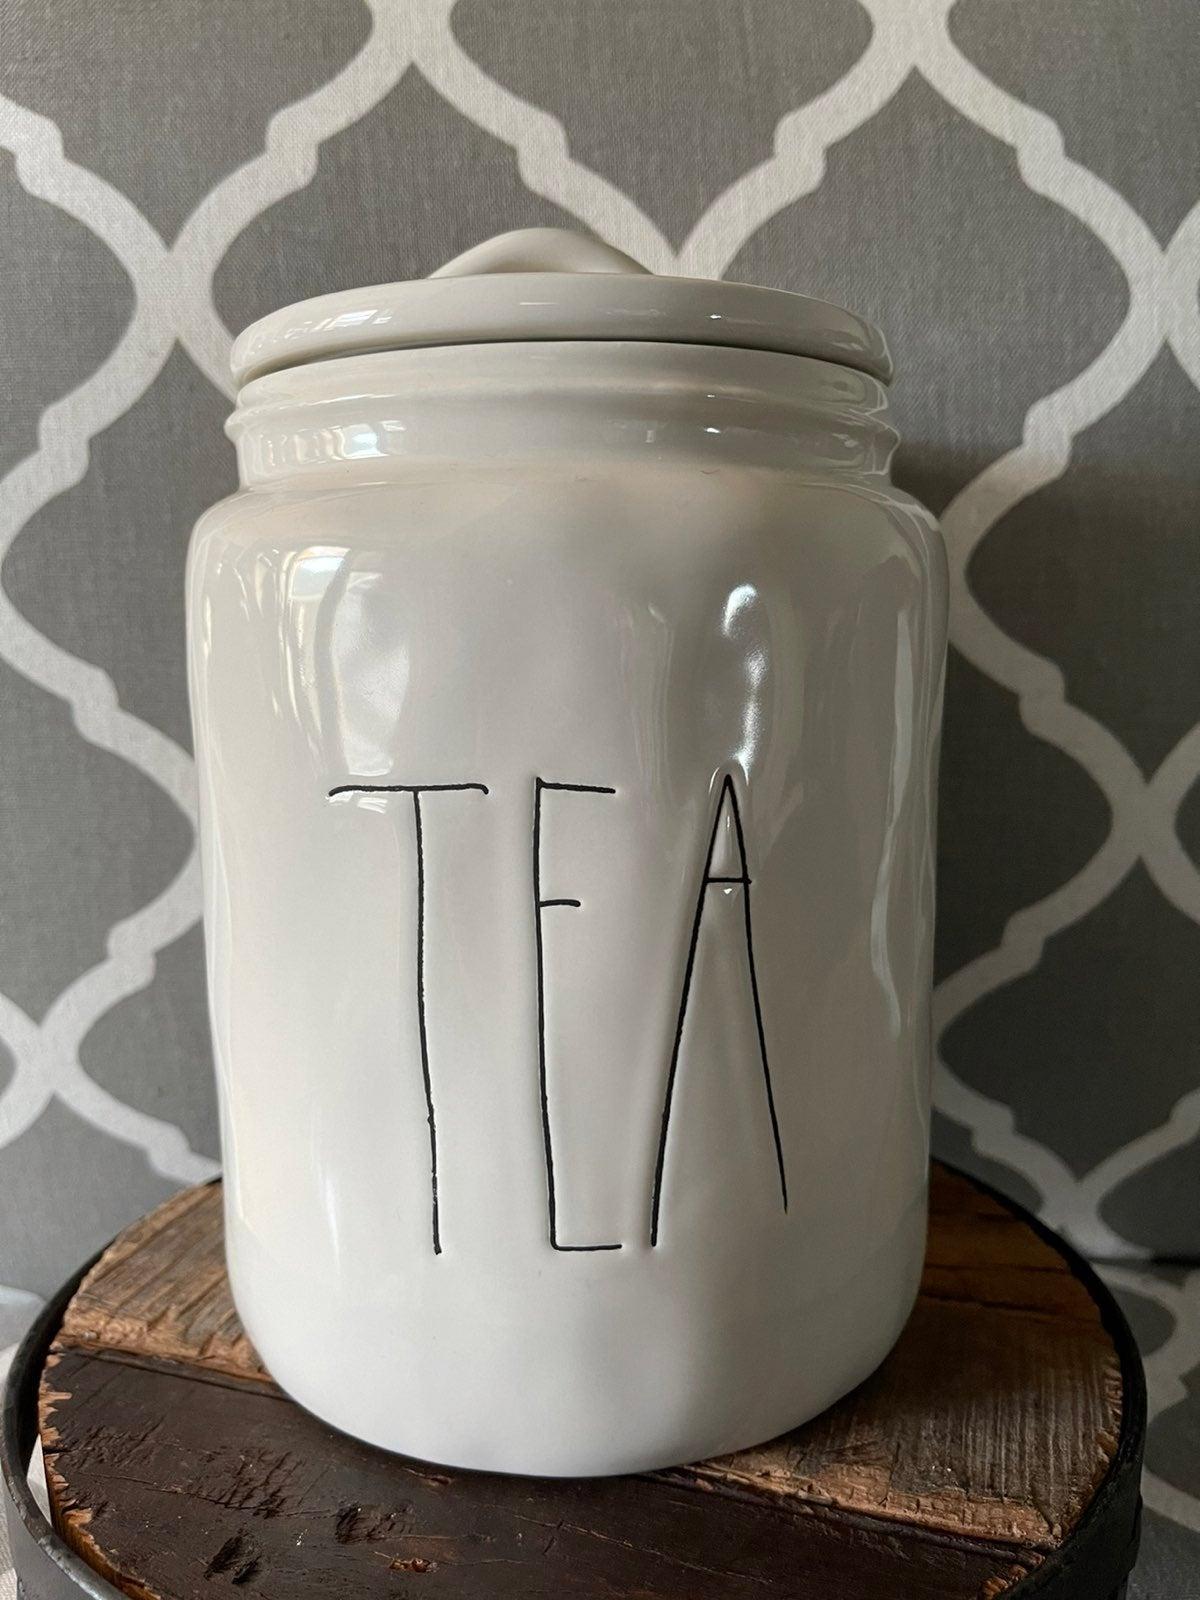 Rae Dunn Original LL 2014 Tea Canister